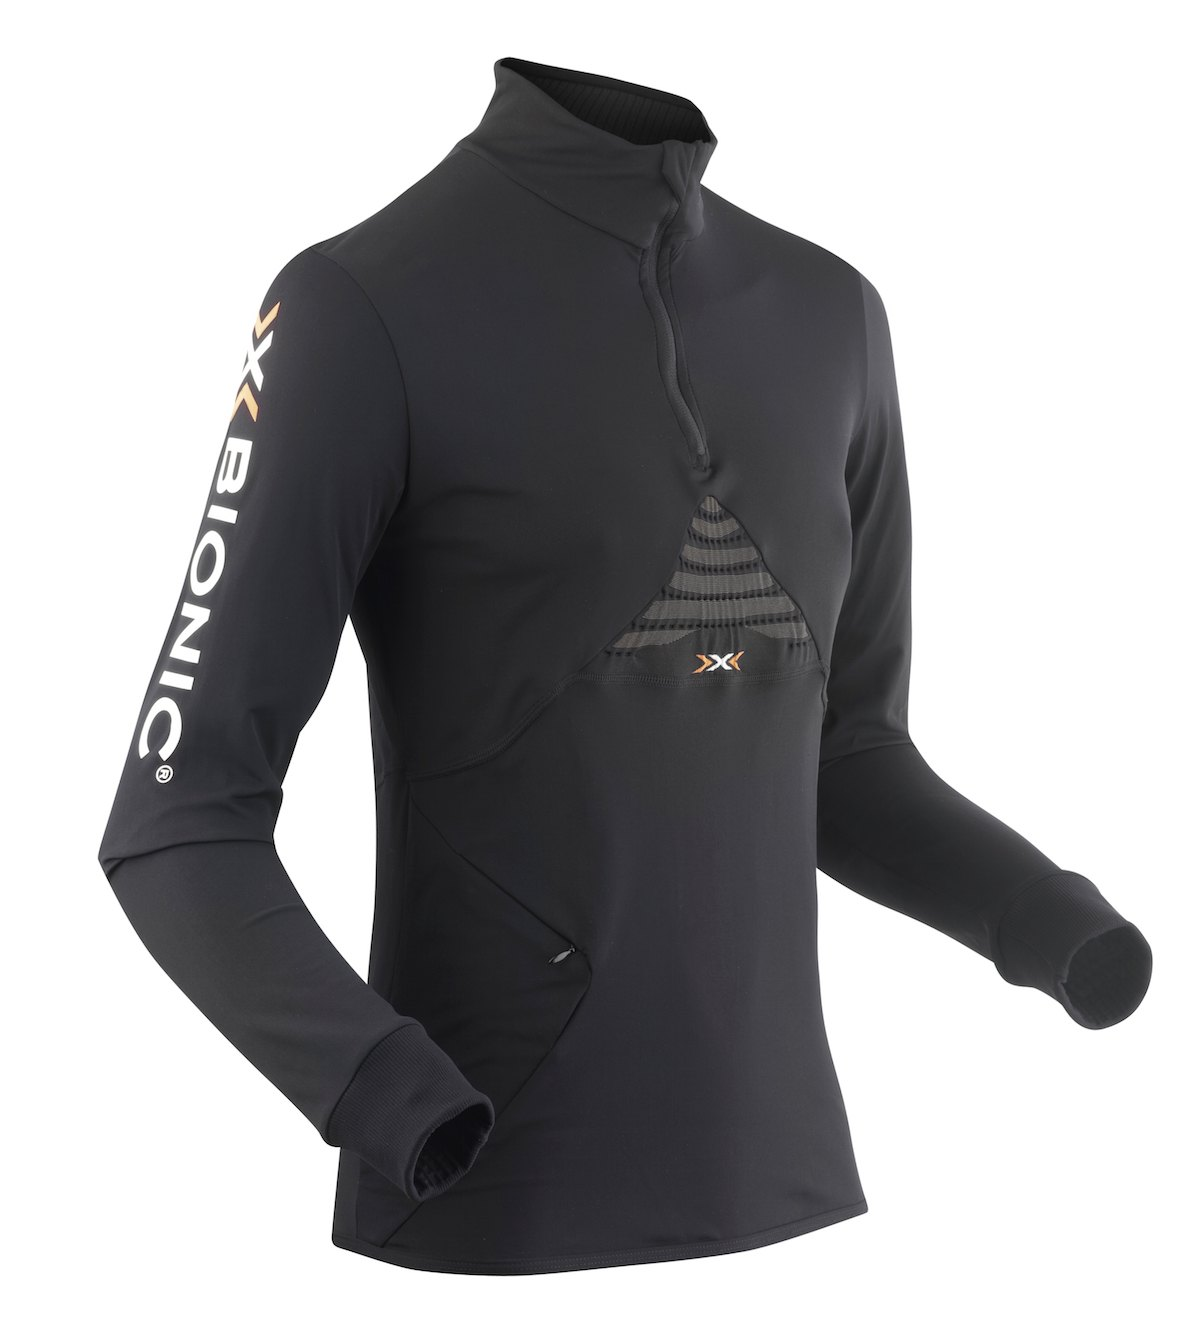 X-Bionic Trail Running Humdinger manches longues - Funktionsshirt - Damen